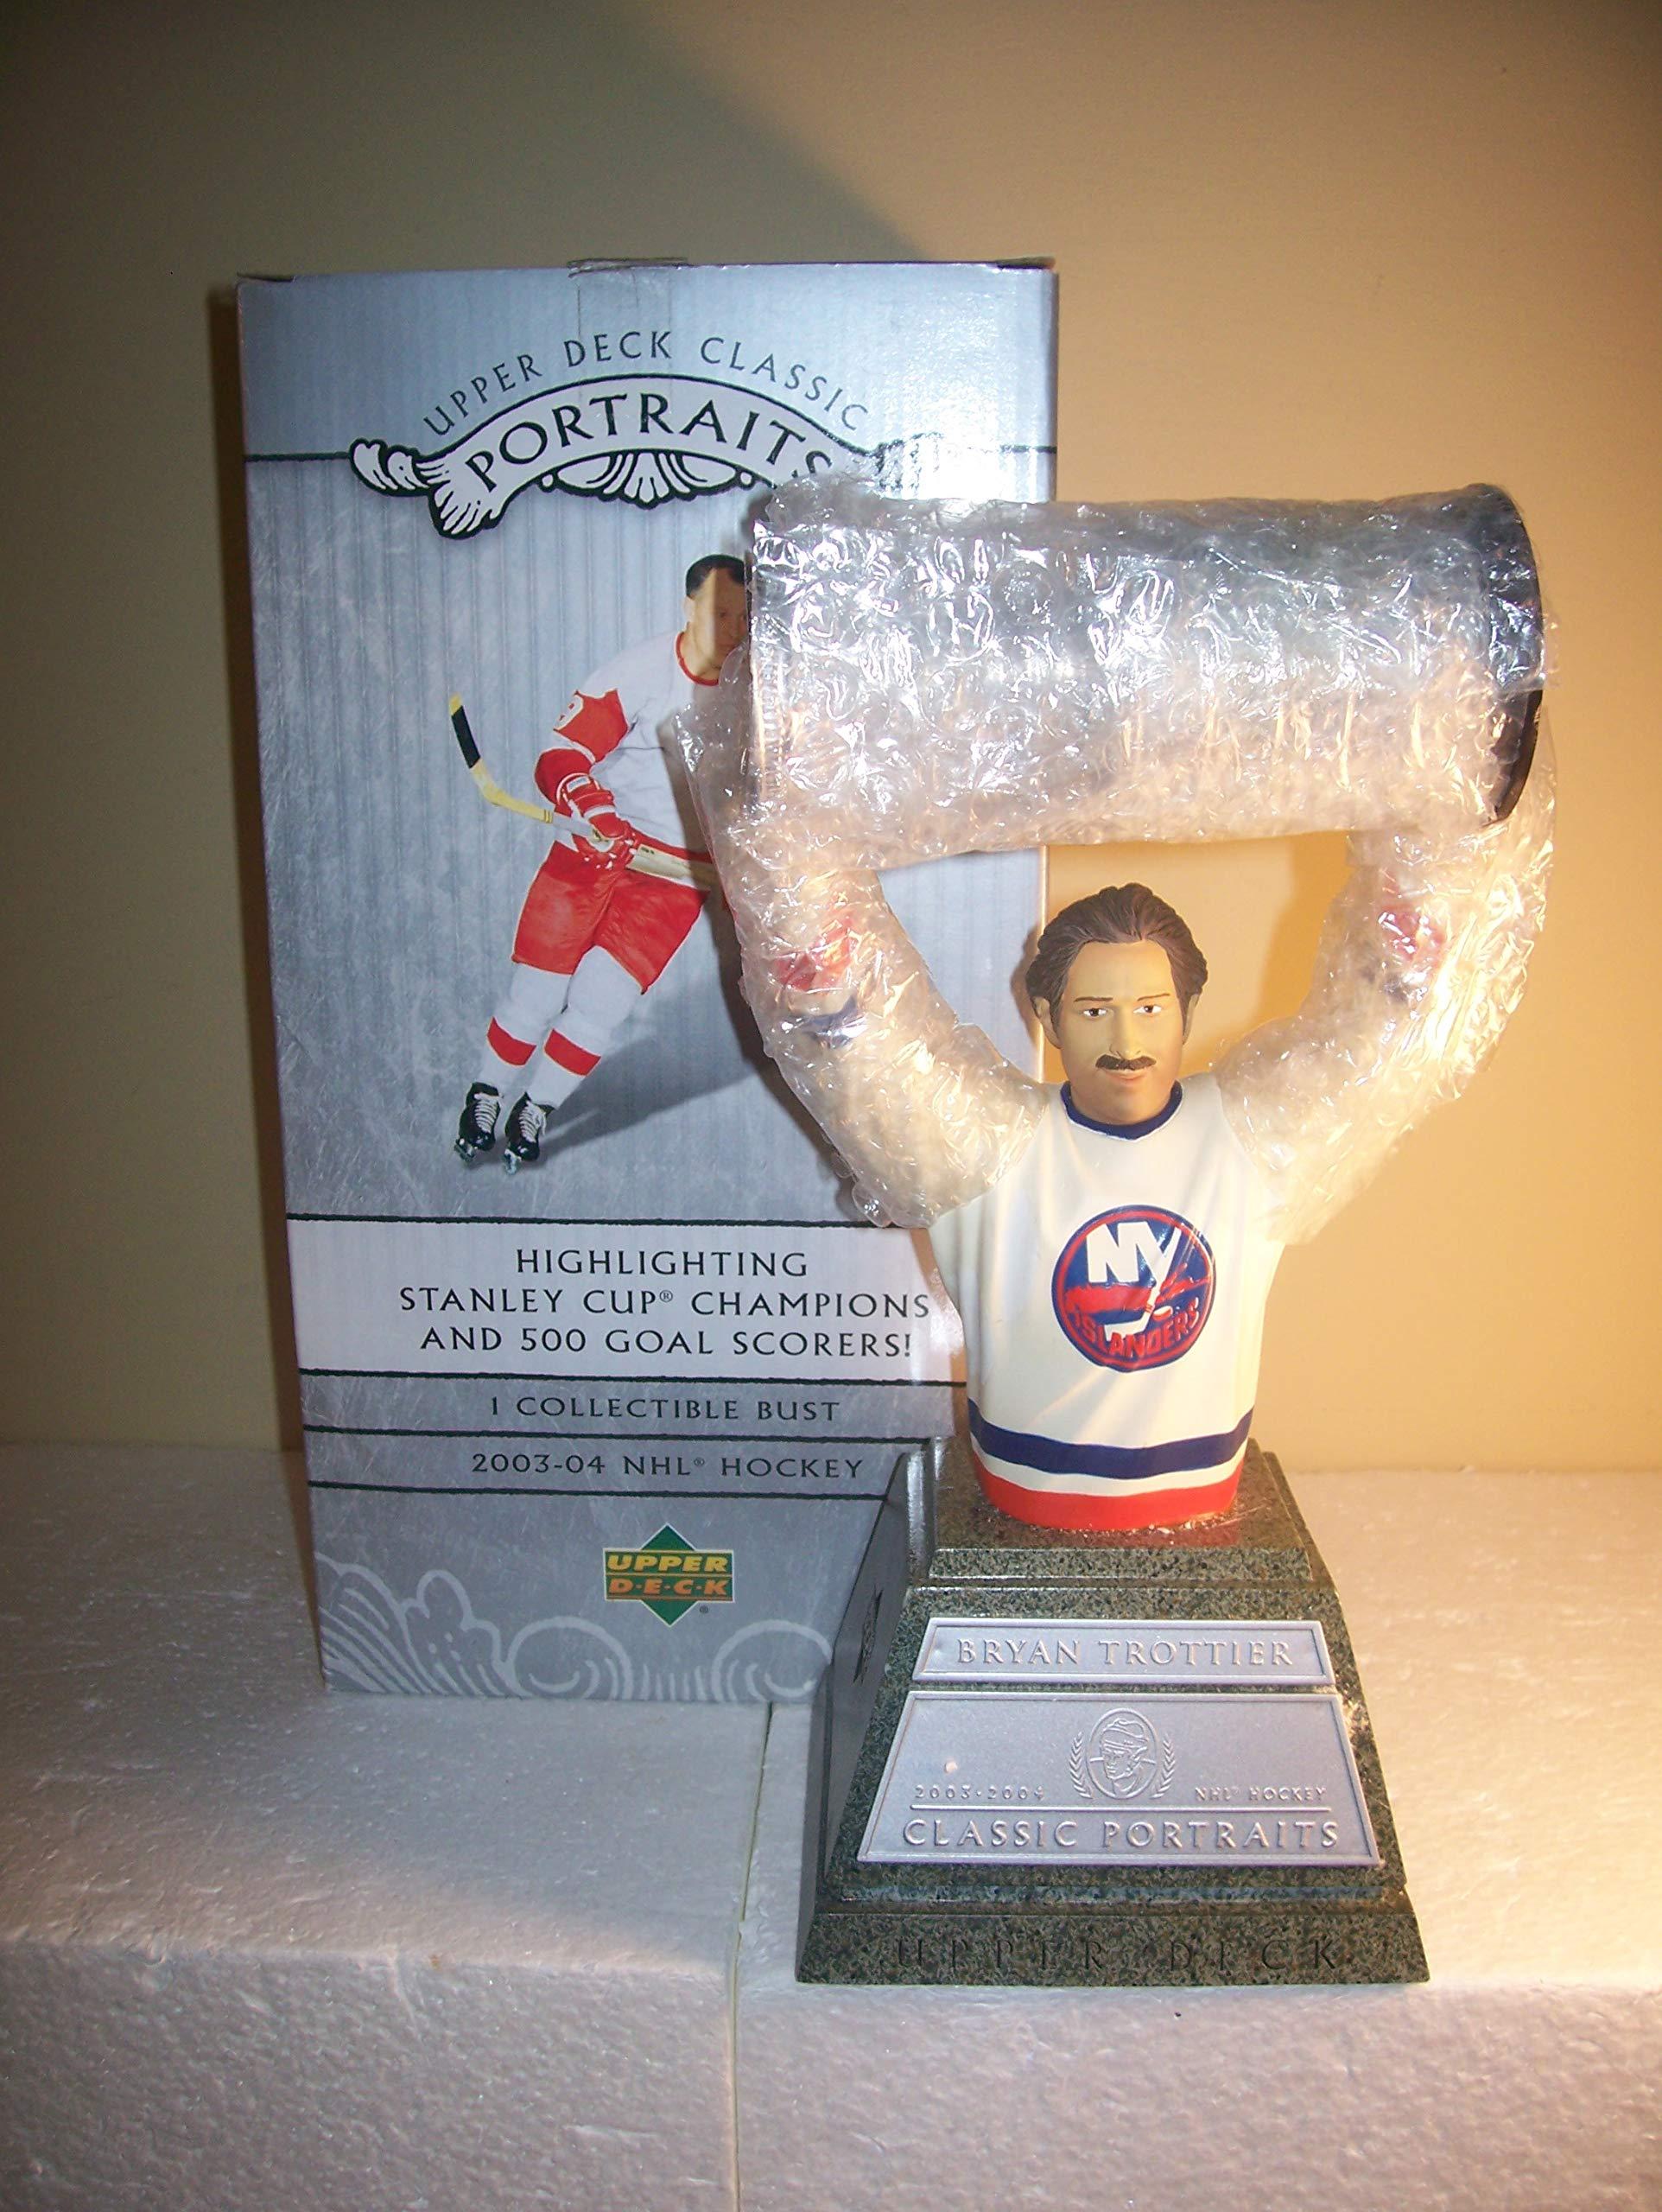 Bryan Trottier New York Islanders Upper Deck Portraits Bust Figurine